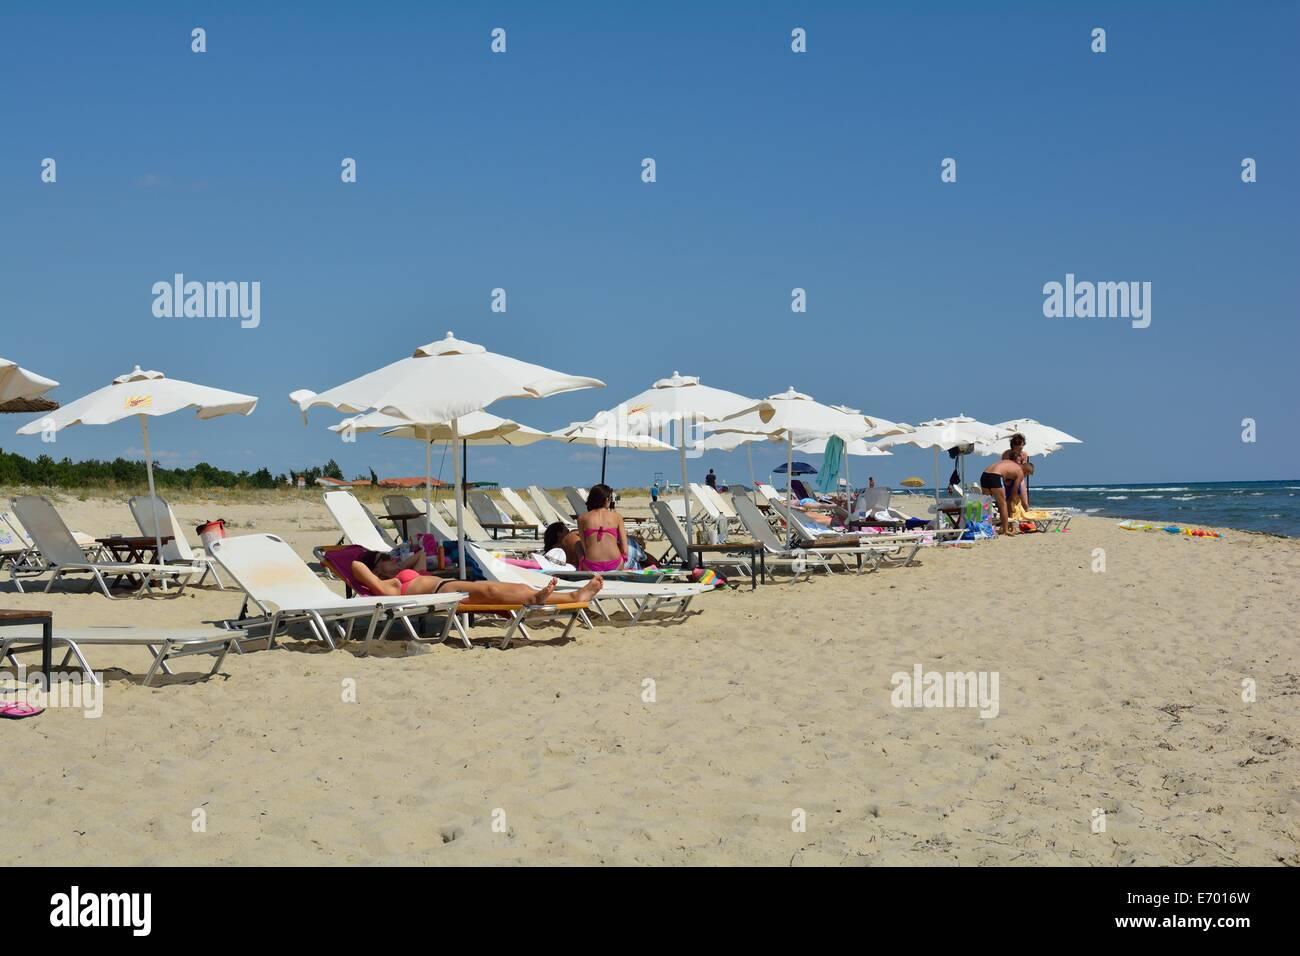 on the beach - Stock Image